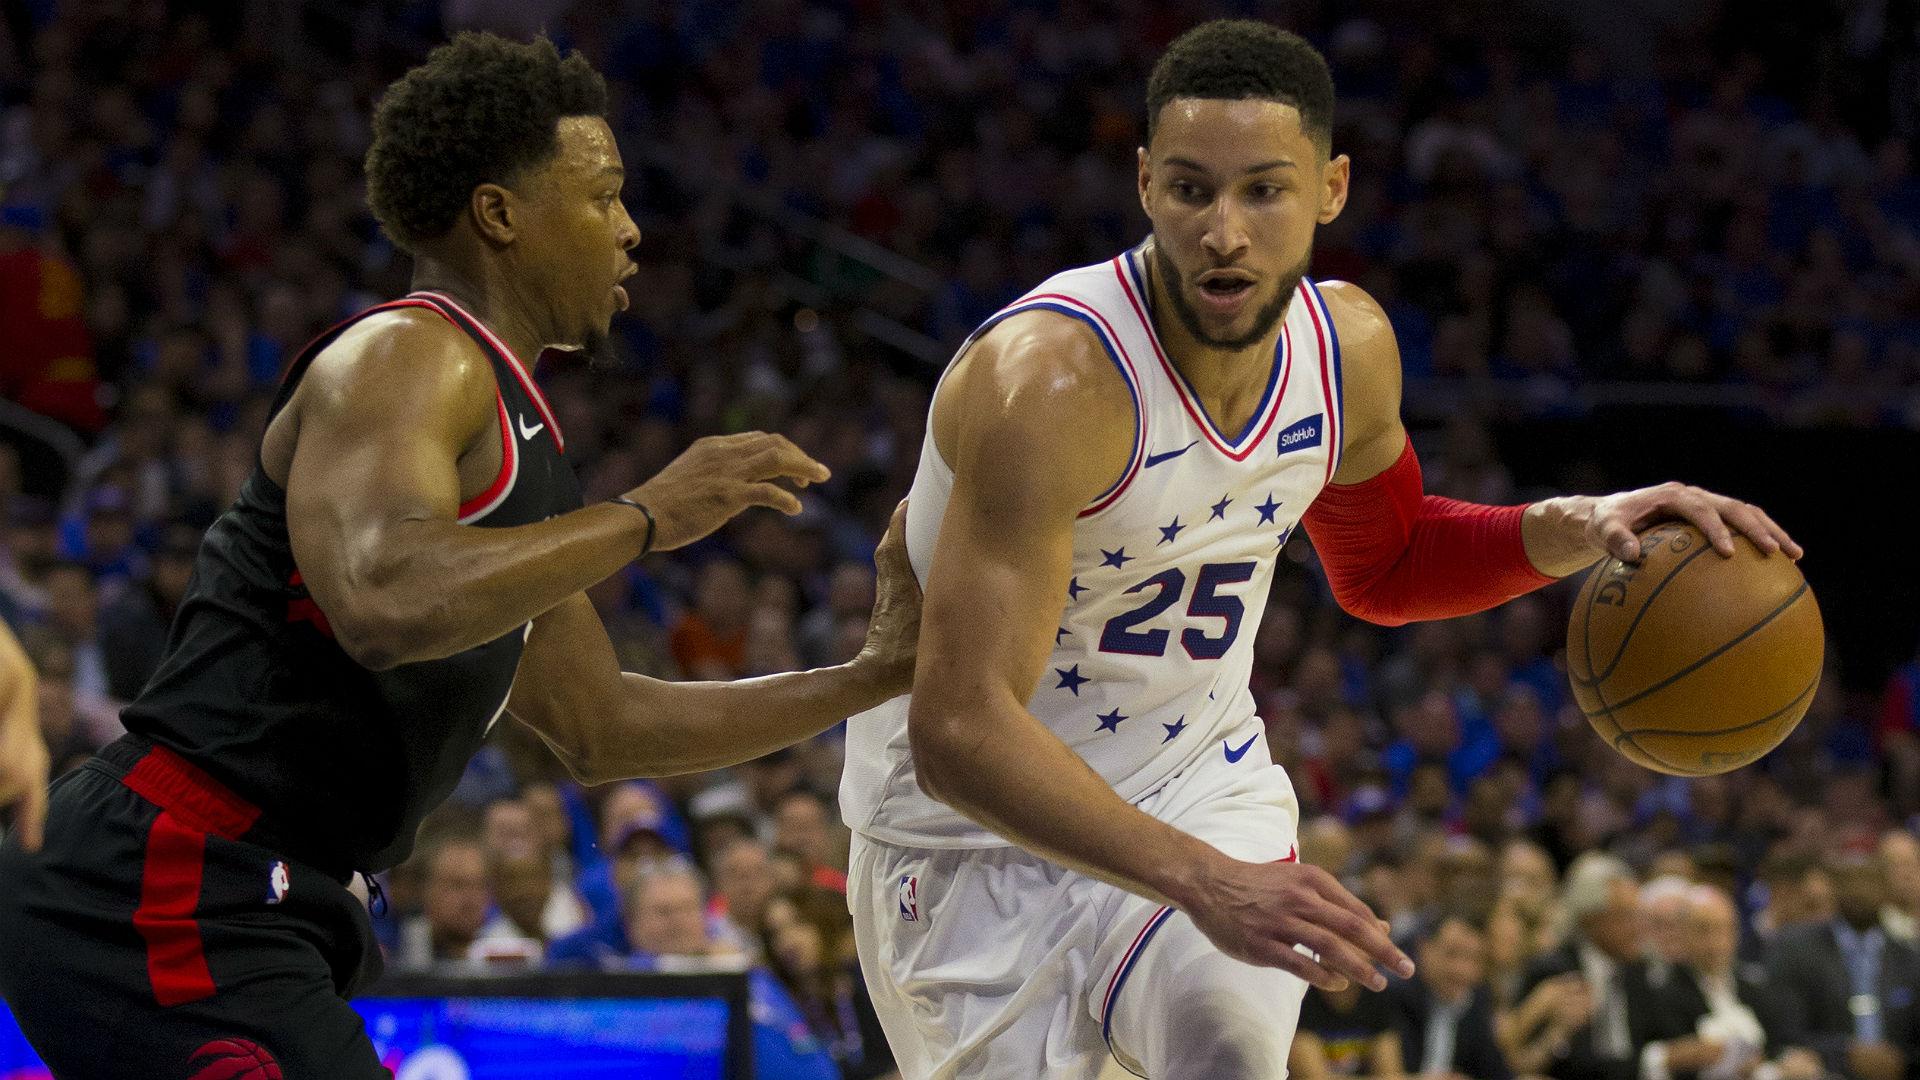 Three takeaways from 76ers' big Game 3 win over Raptors